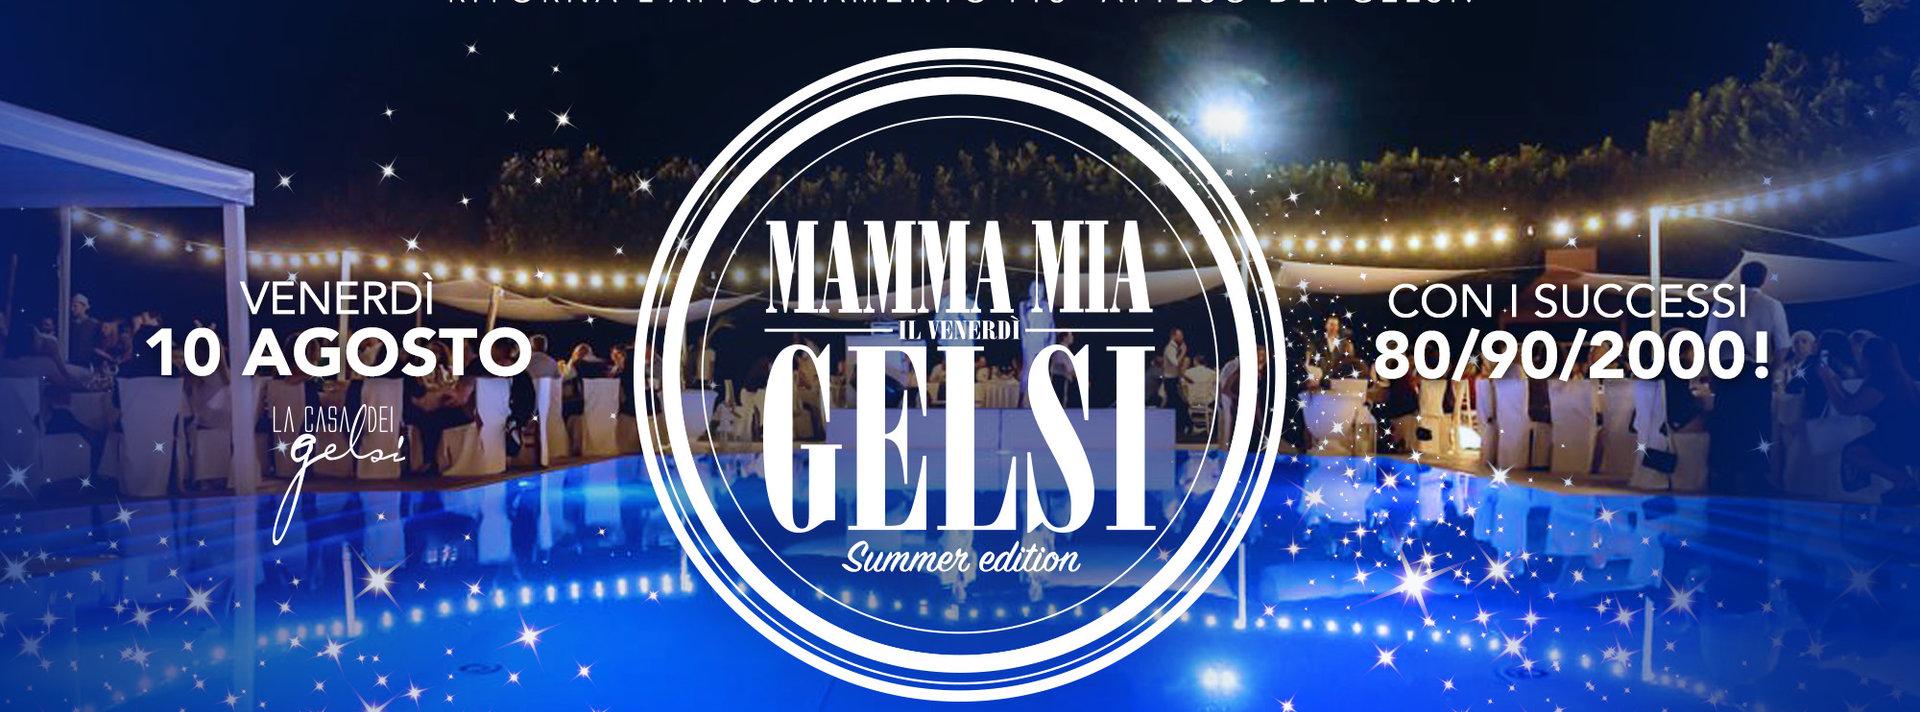 Gelsi - Mammamia San Lorenzo - 10 agosto 2018